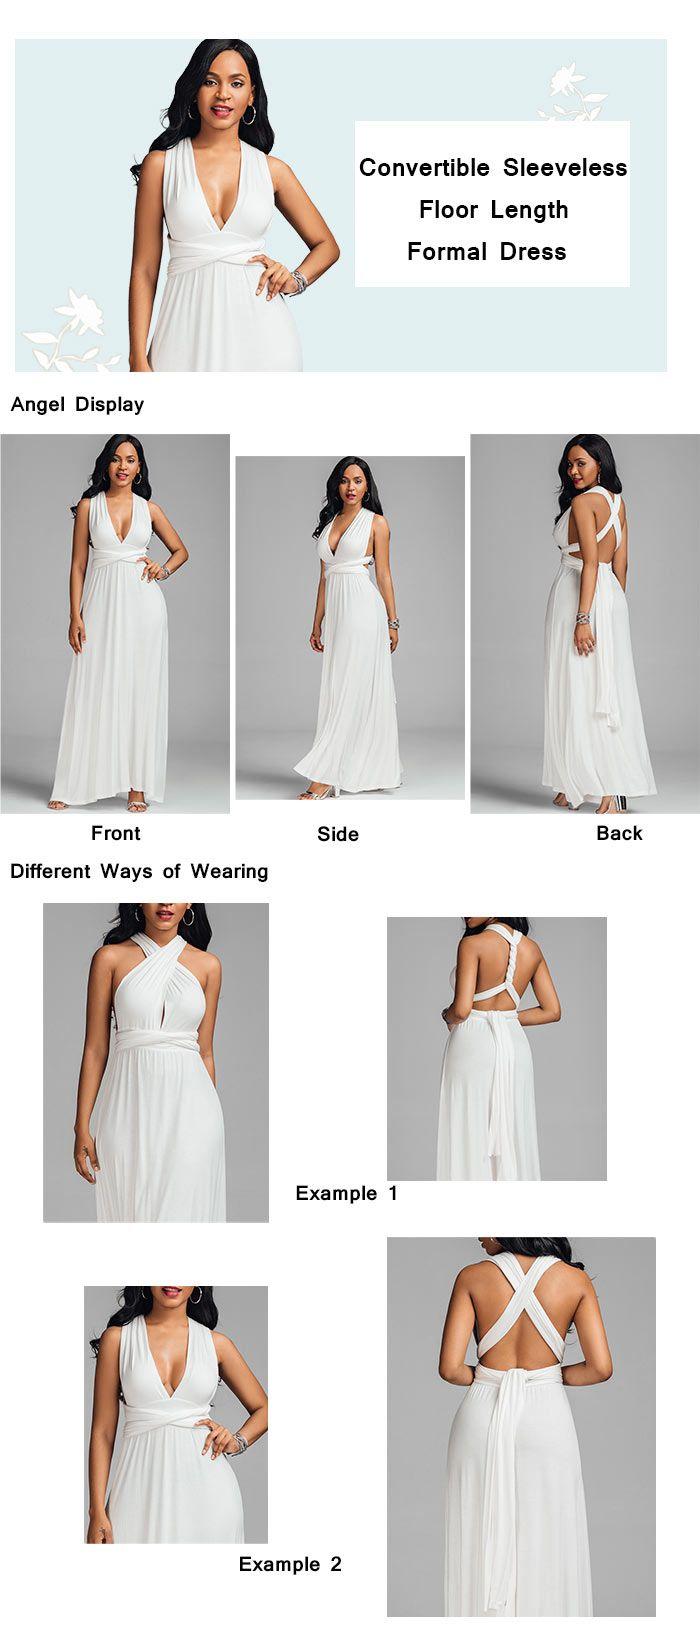 Sleeveless Convertible Floor Length Formal Dress